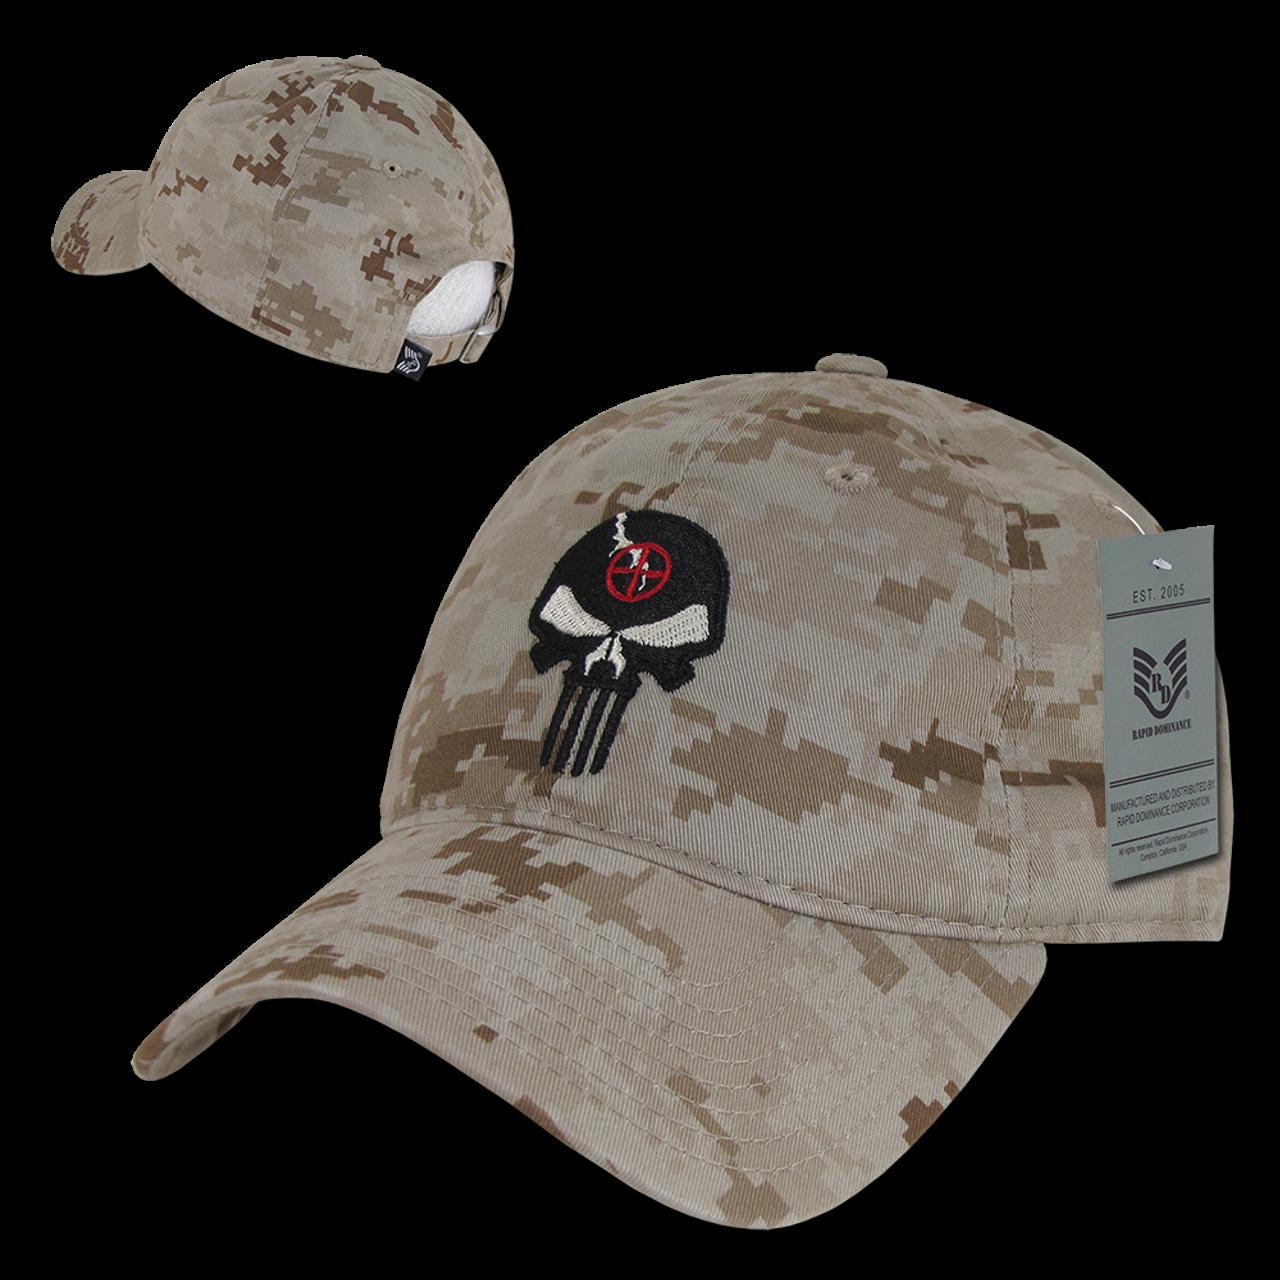 230e7e90 A03 - Punisher Skull Tactical Operator Cap - Relaxed Cotton - Desert  Digital Camouflage